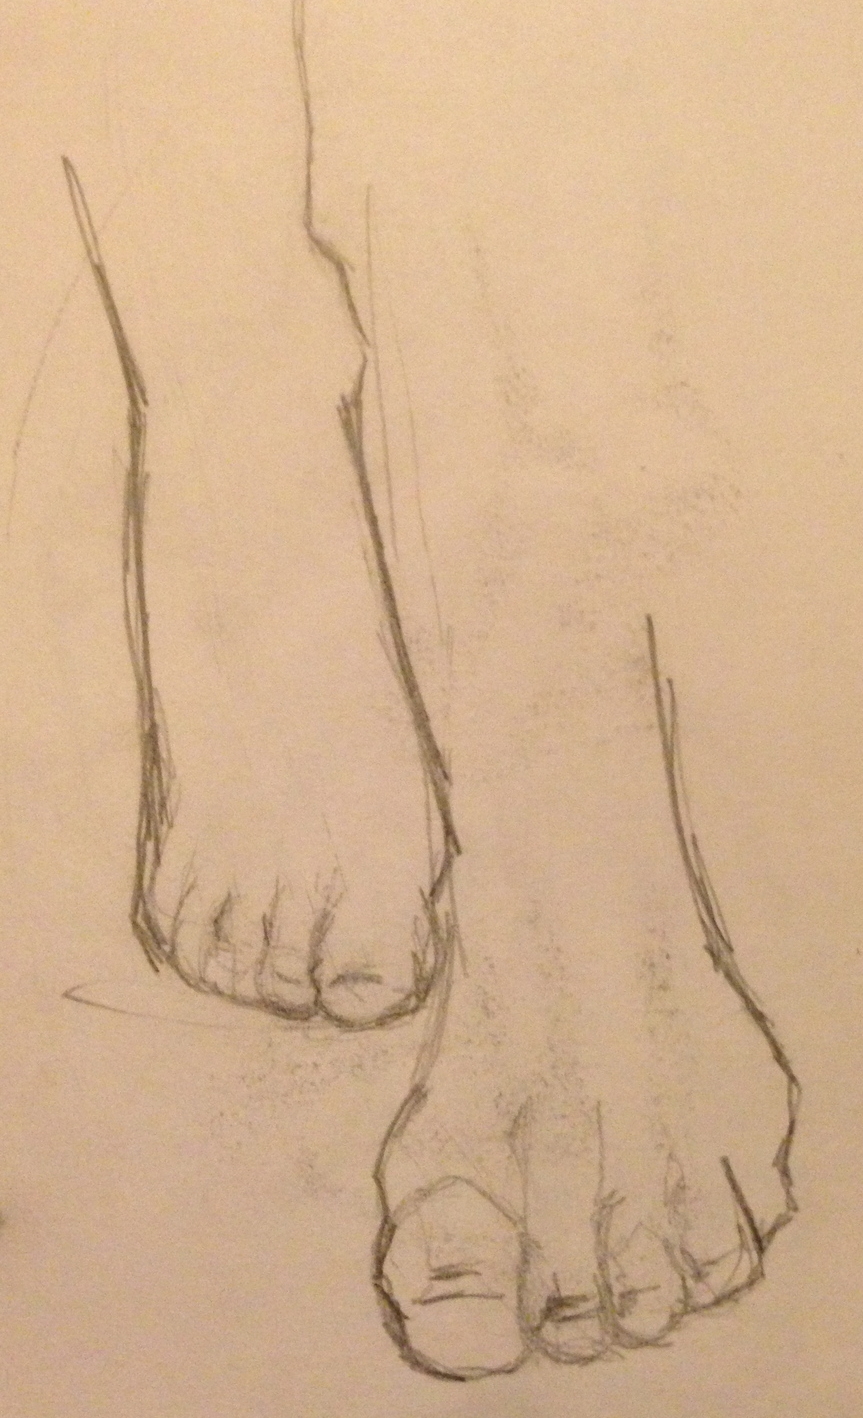 Feet Study No. 2